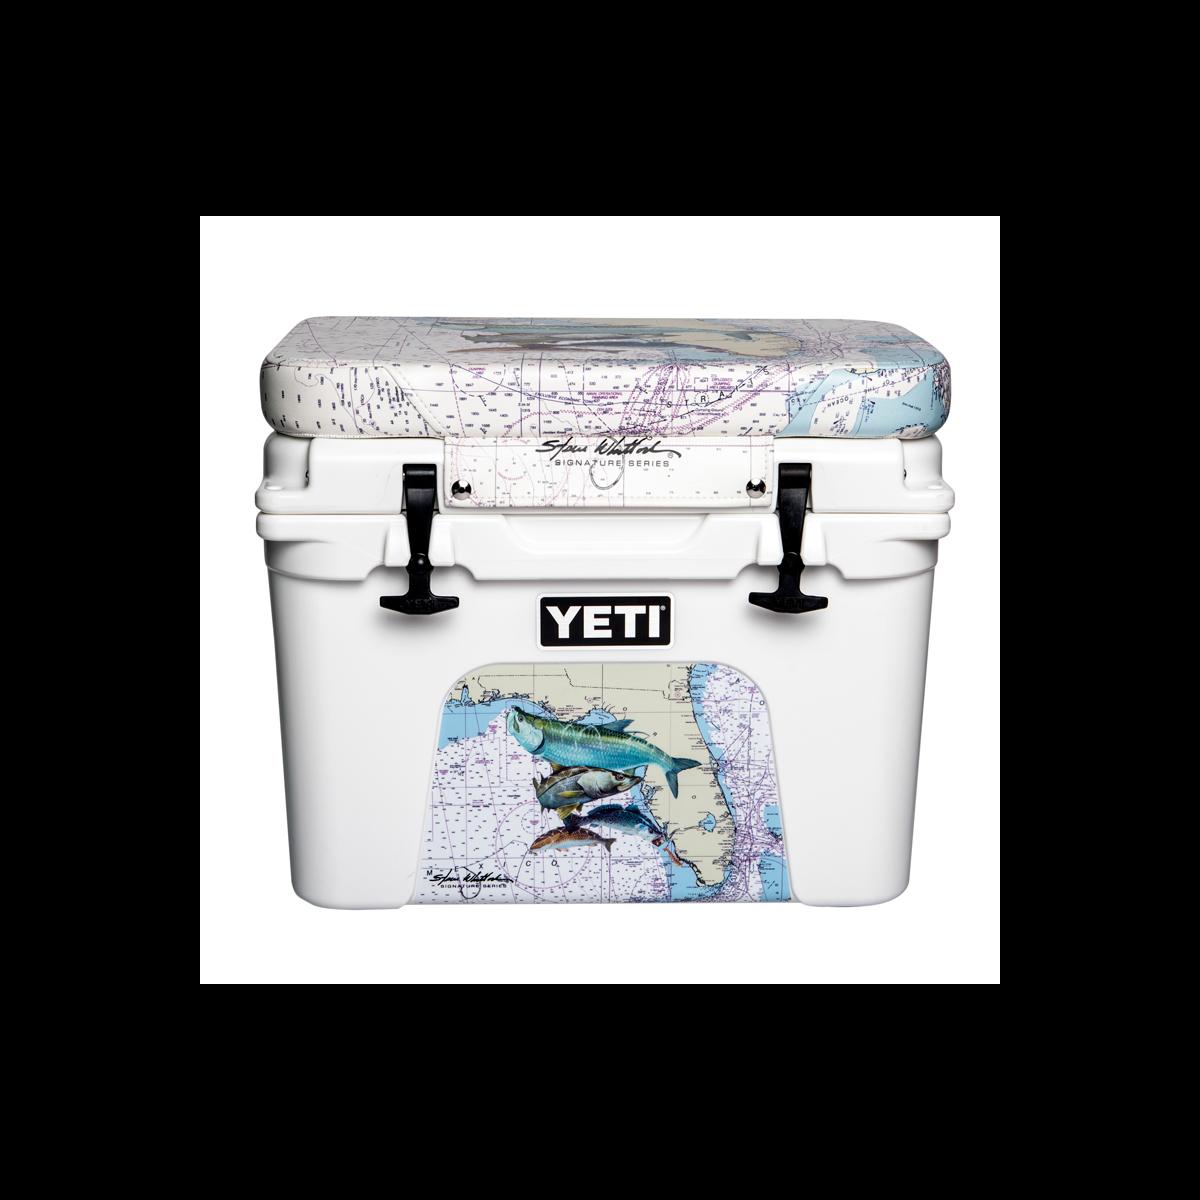 Tempress Yeti Tundra 45 Artist Series Cushion and Wrap